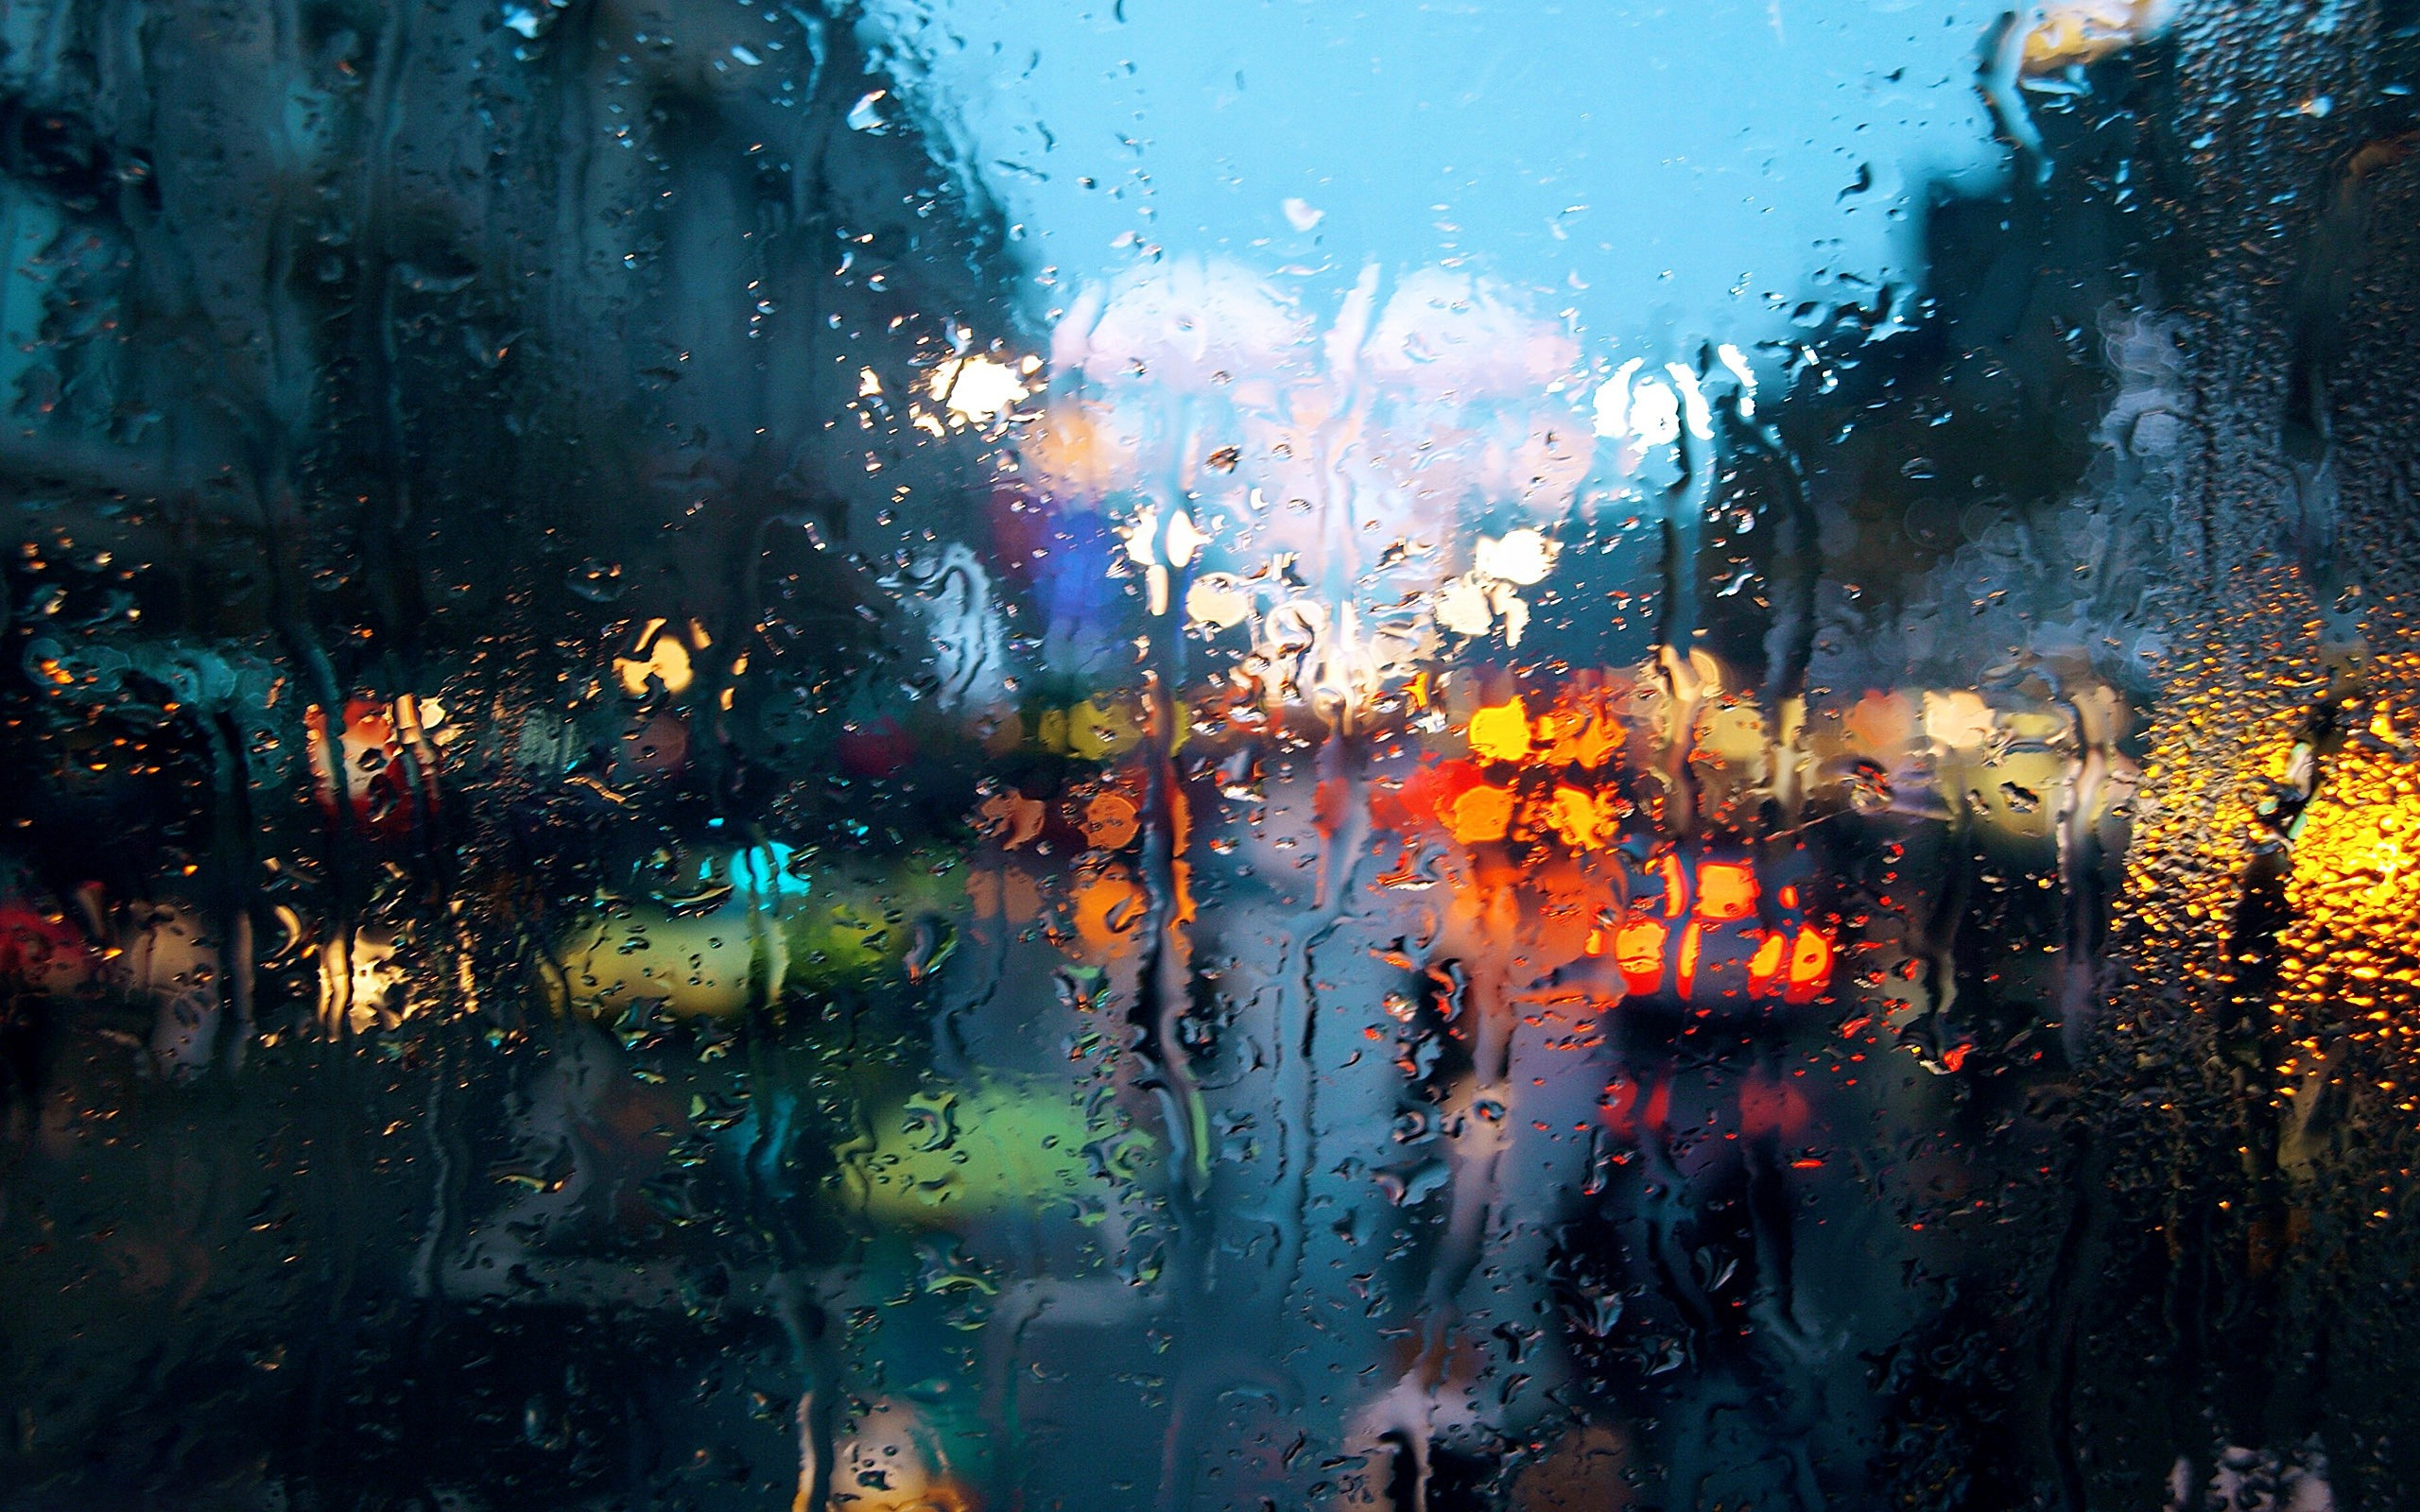 Rain On Glass Wallpapers